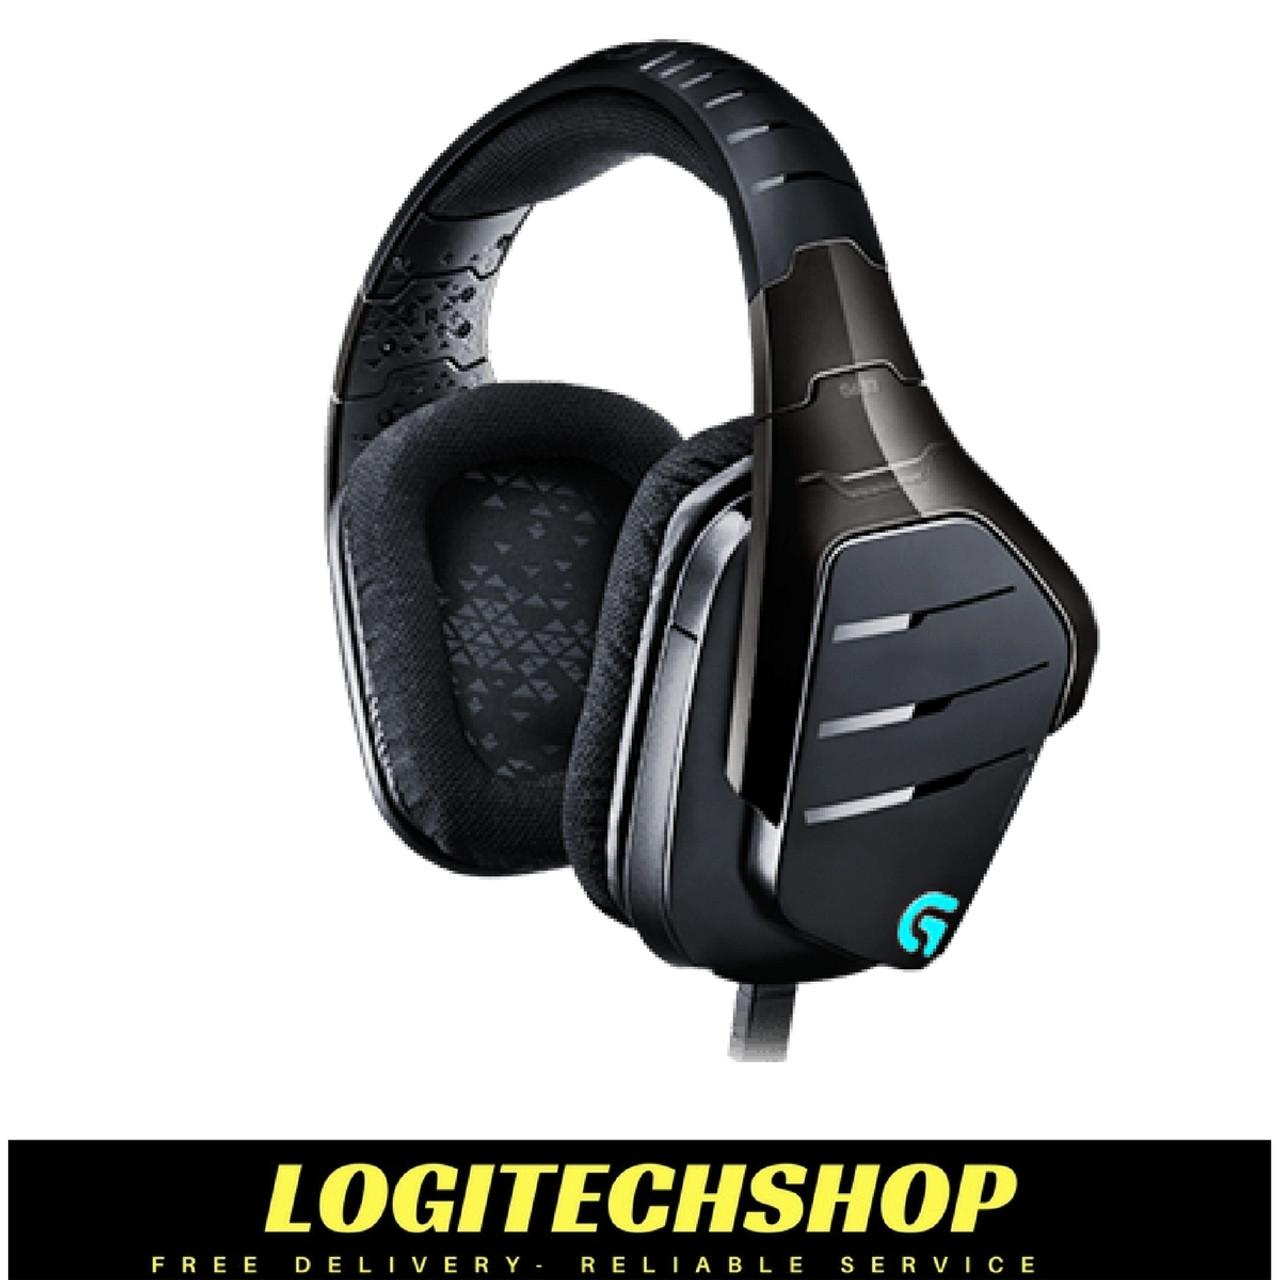 Logitech G633 Artemis Spectrum RGB 7.1 Surround Gaming Headset ...